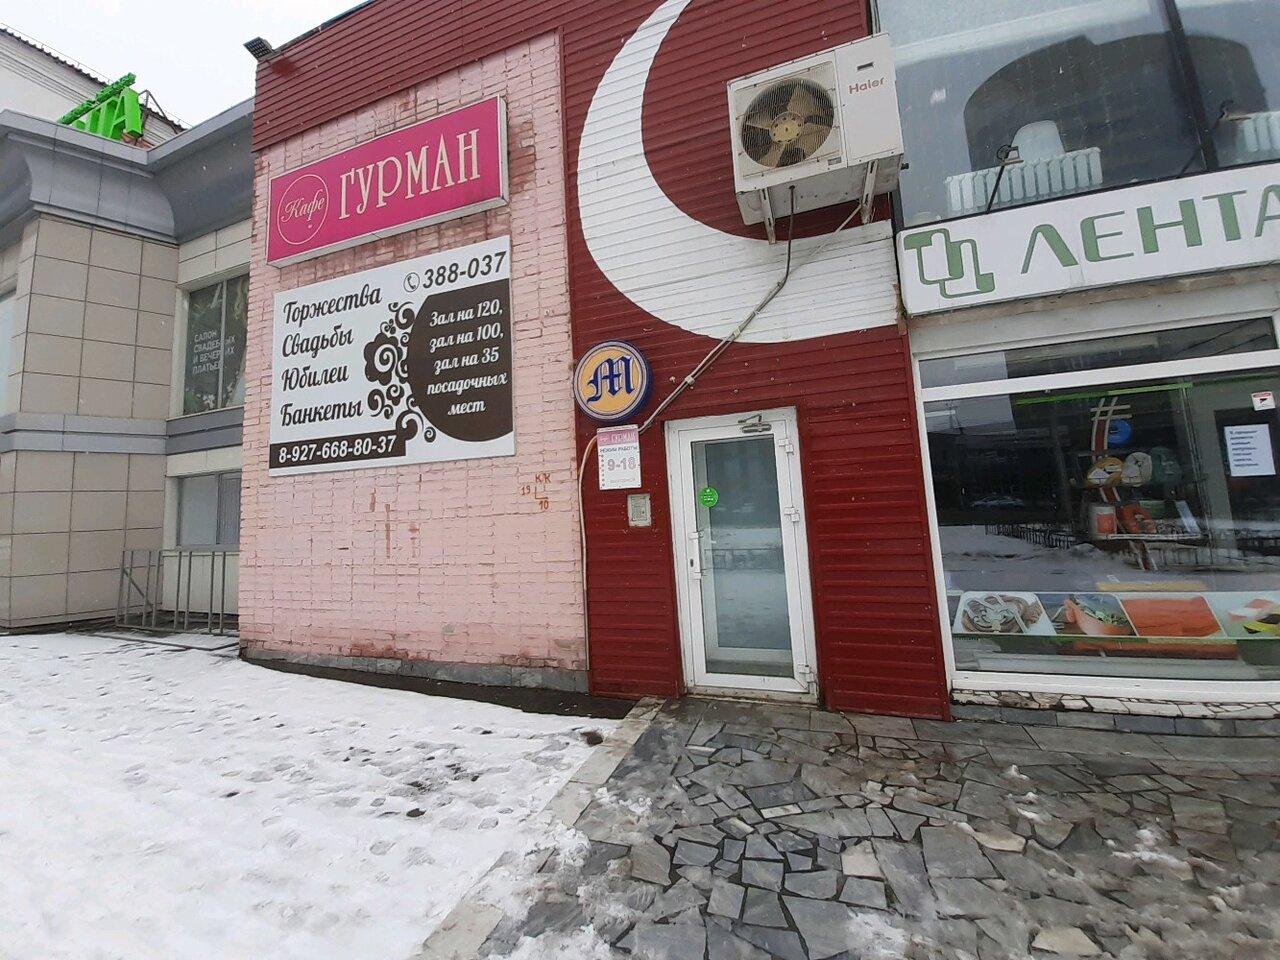 рекорд, кафе гурман чебоксары фото видел огромный рост